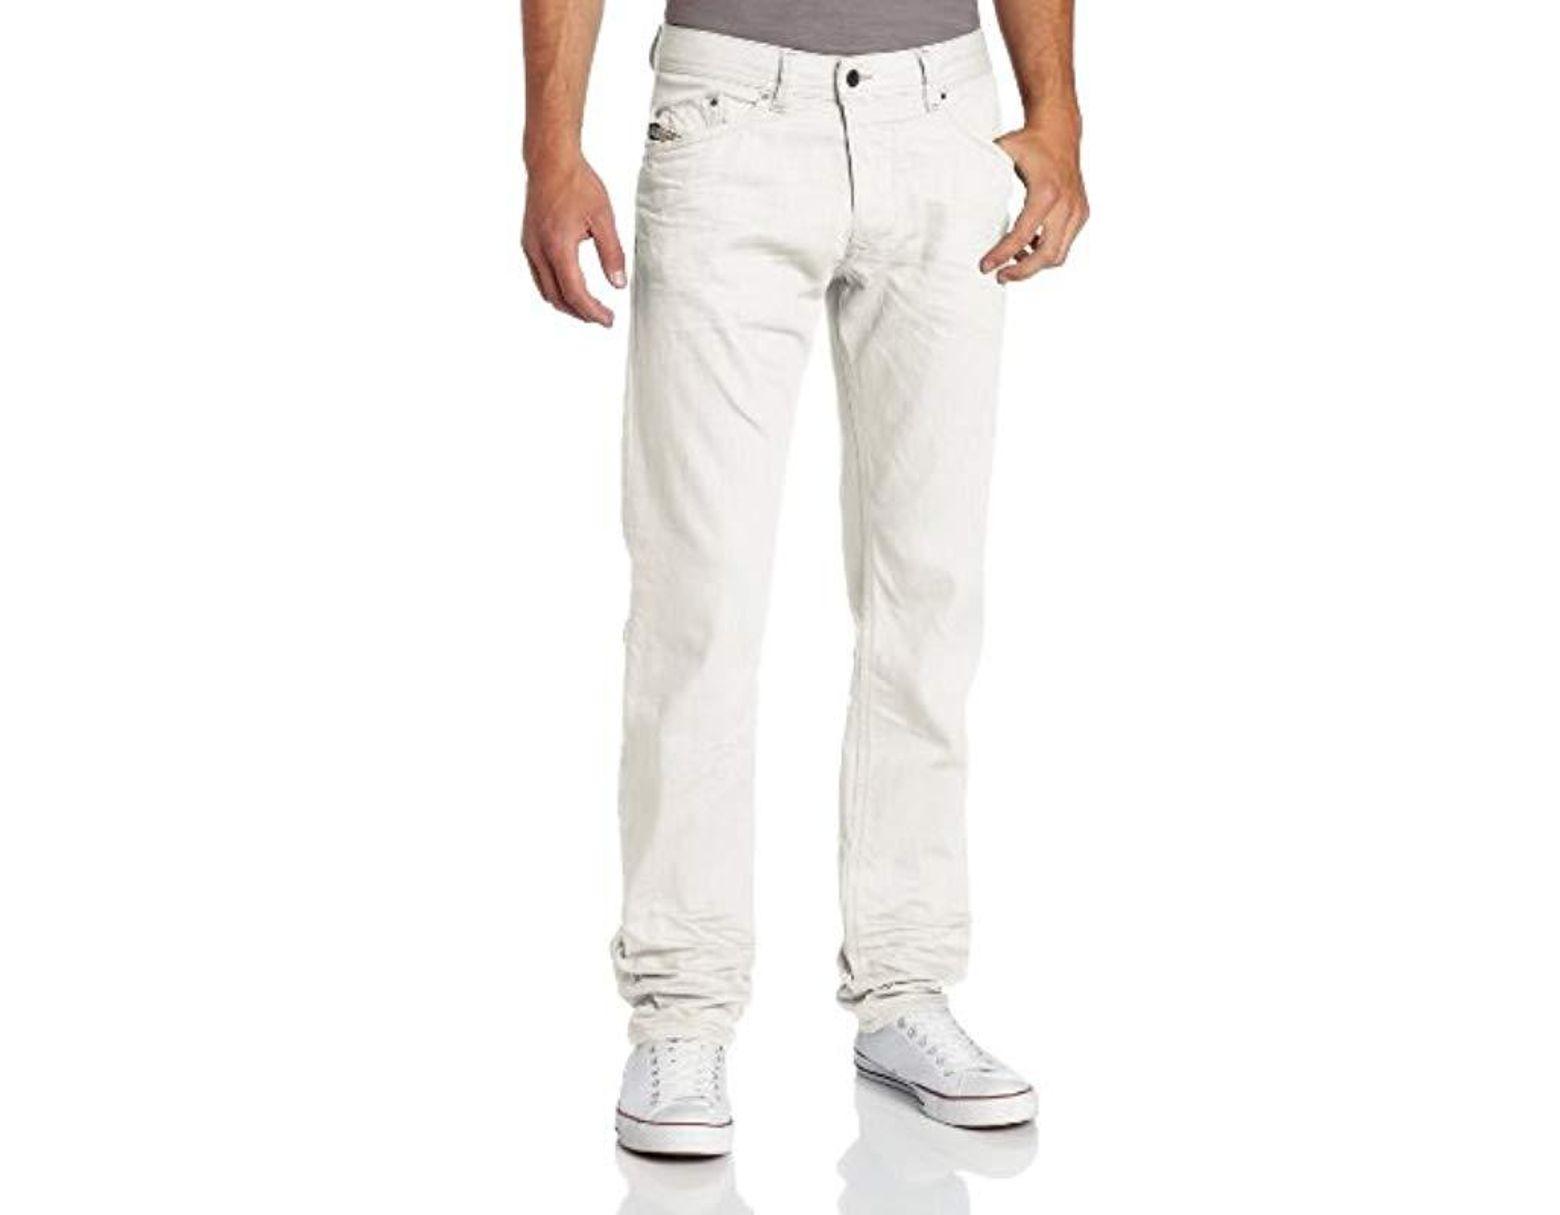 a1c06324 DIESEL Darron Regular Slim Tapered-leg Jean 008qu in White for Men - Lyst